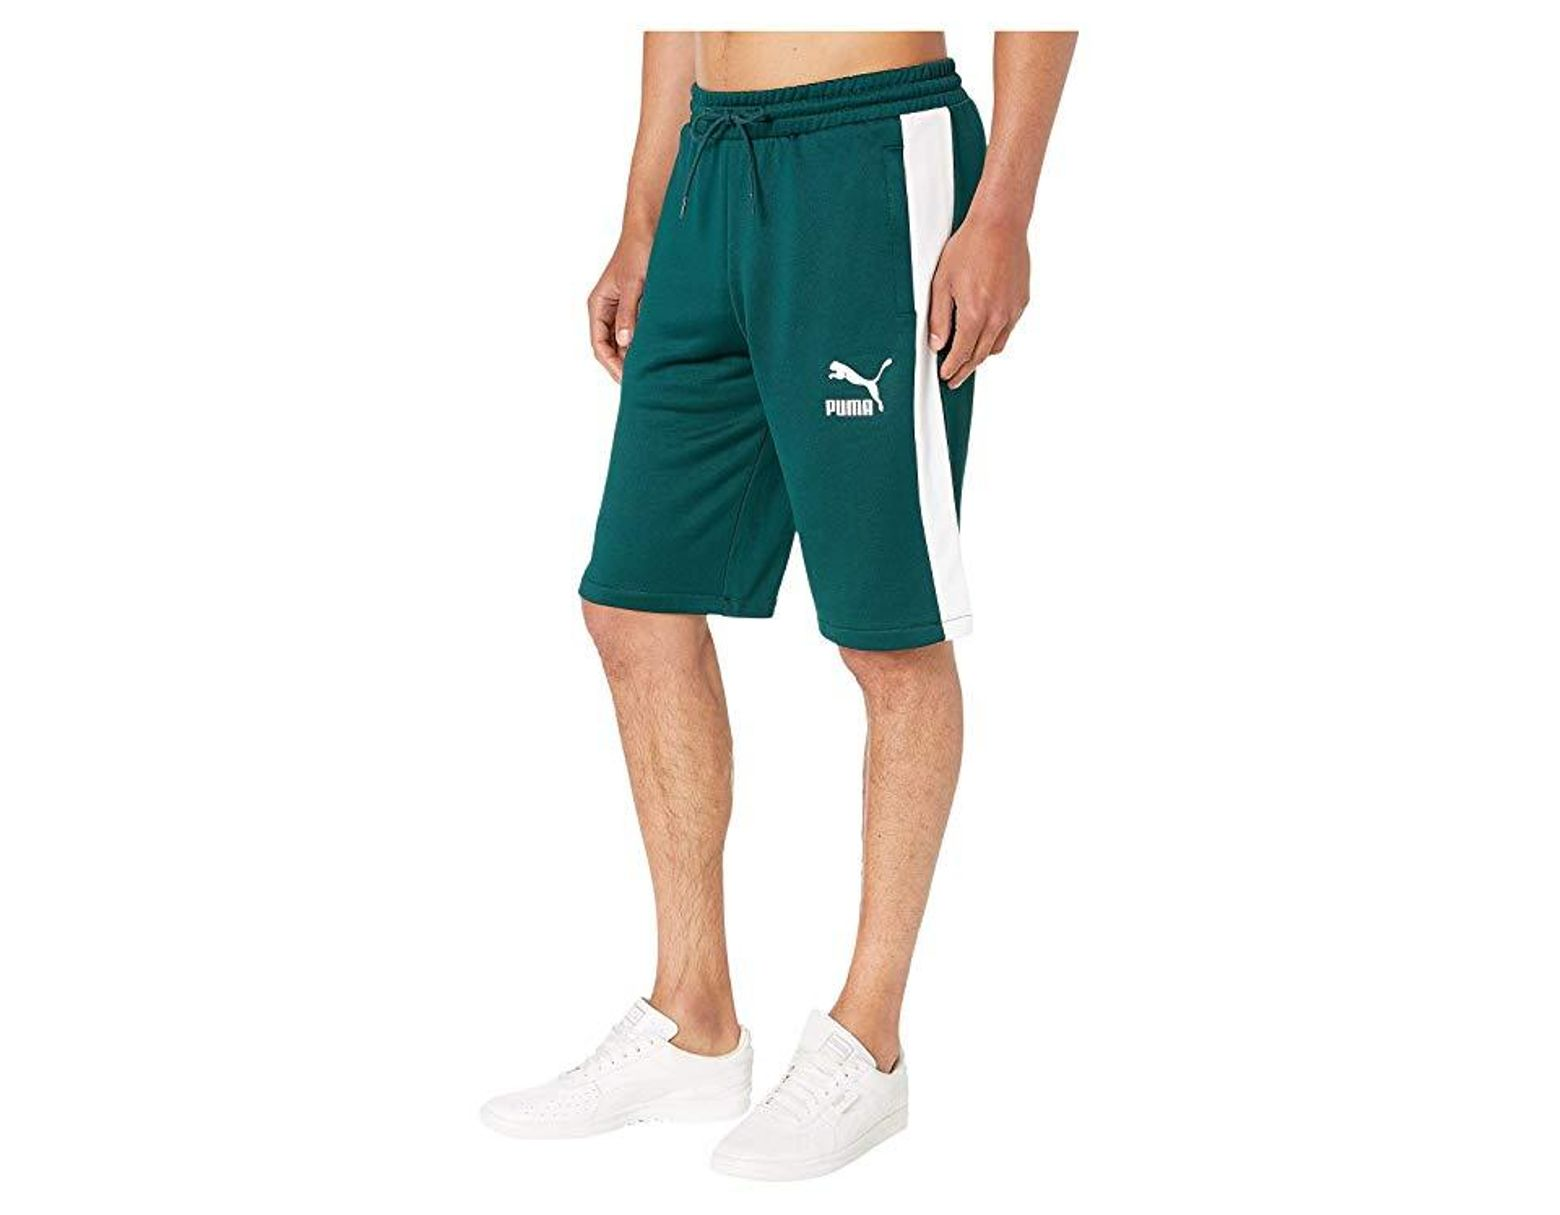 6dfb7335a1f3c PUMA T7 Freizeit Shorts (ponderosa Pine) Shorts in Blue for Men - Lyst